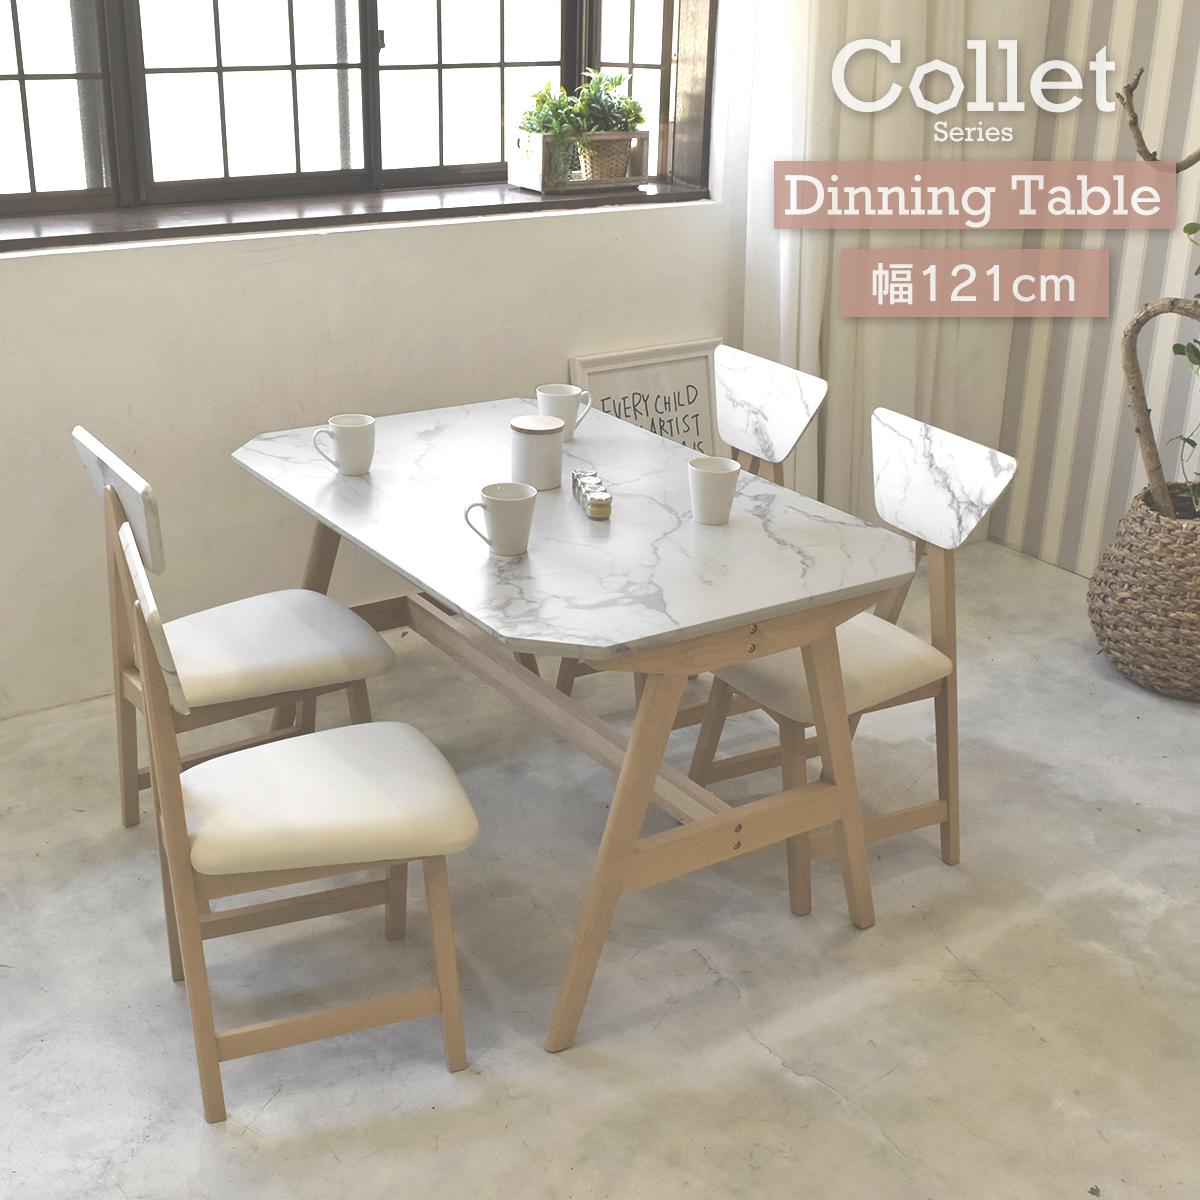 Collet コレット ダイニングテーブル 幅121 CODT-121 長方形 天然木 バーチ材 大理石柄